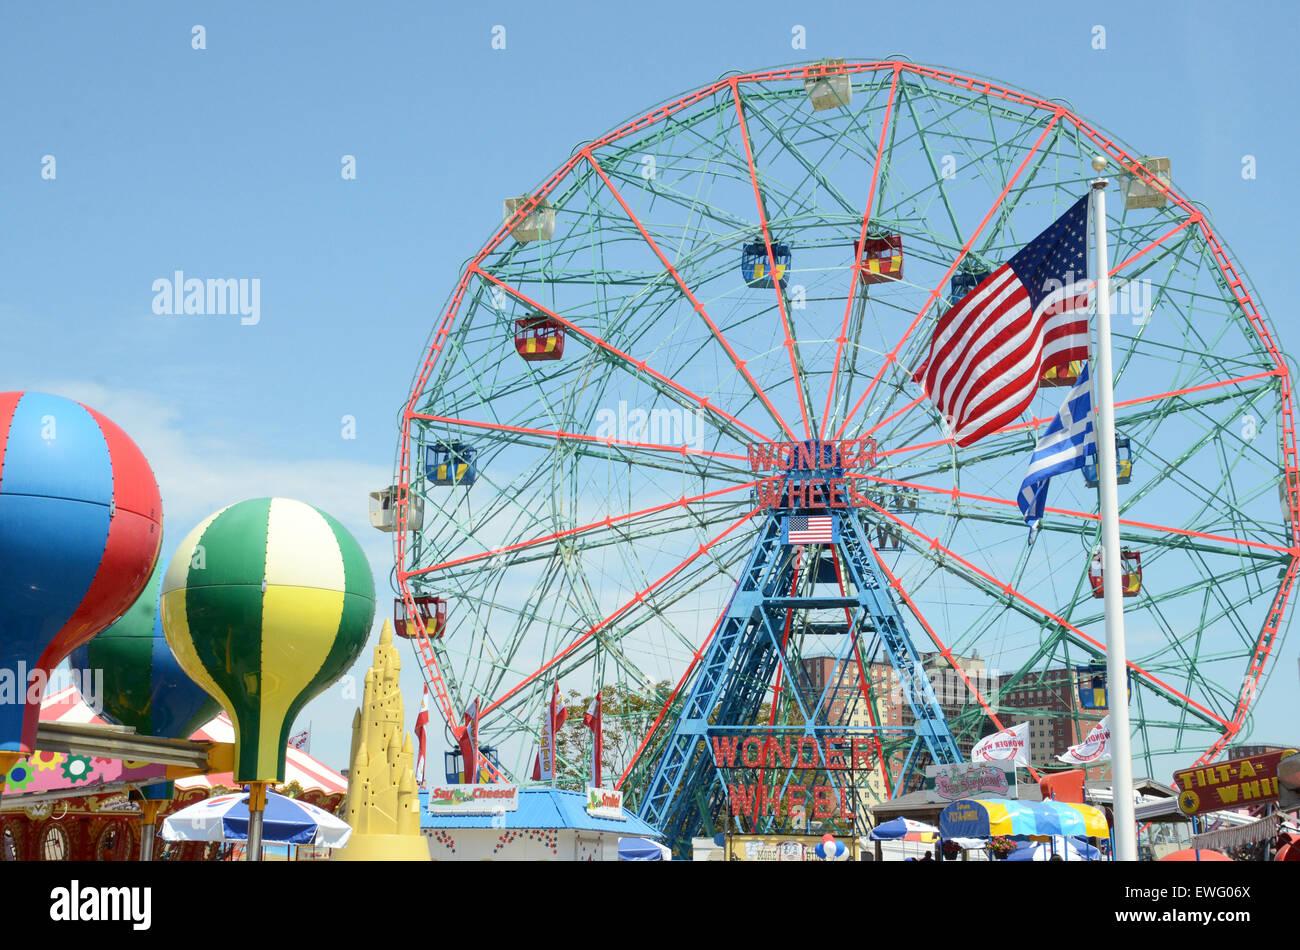 wonder wheel coney island brooklyn new york - Stock Image